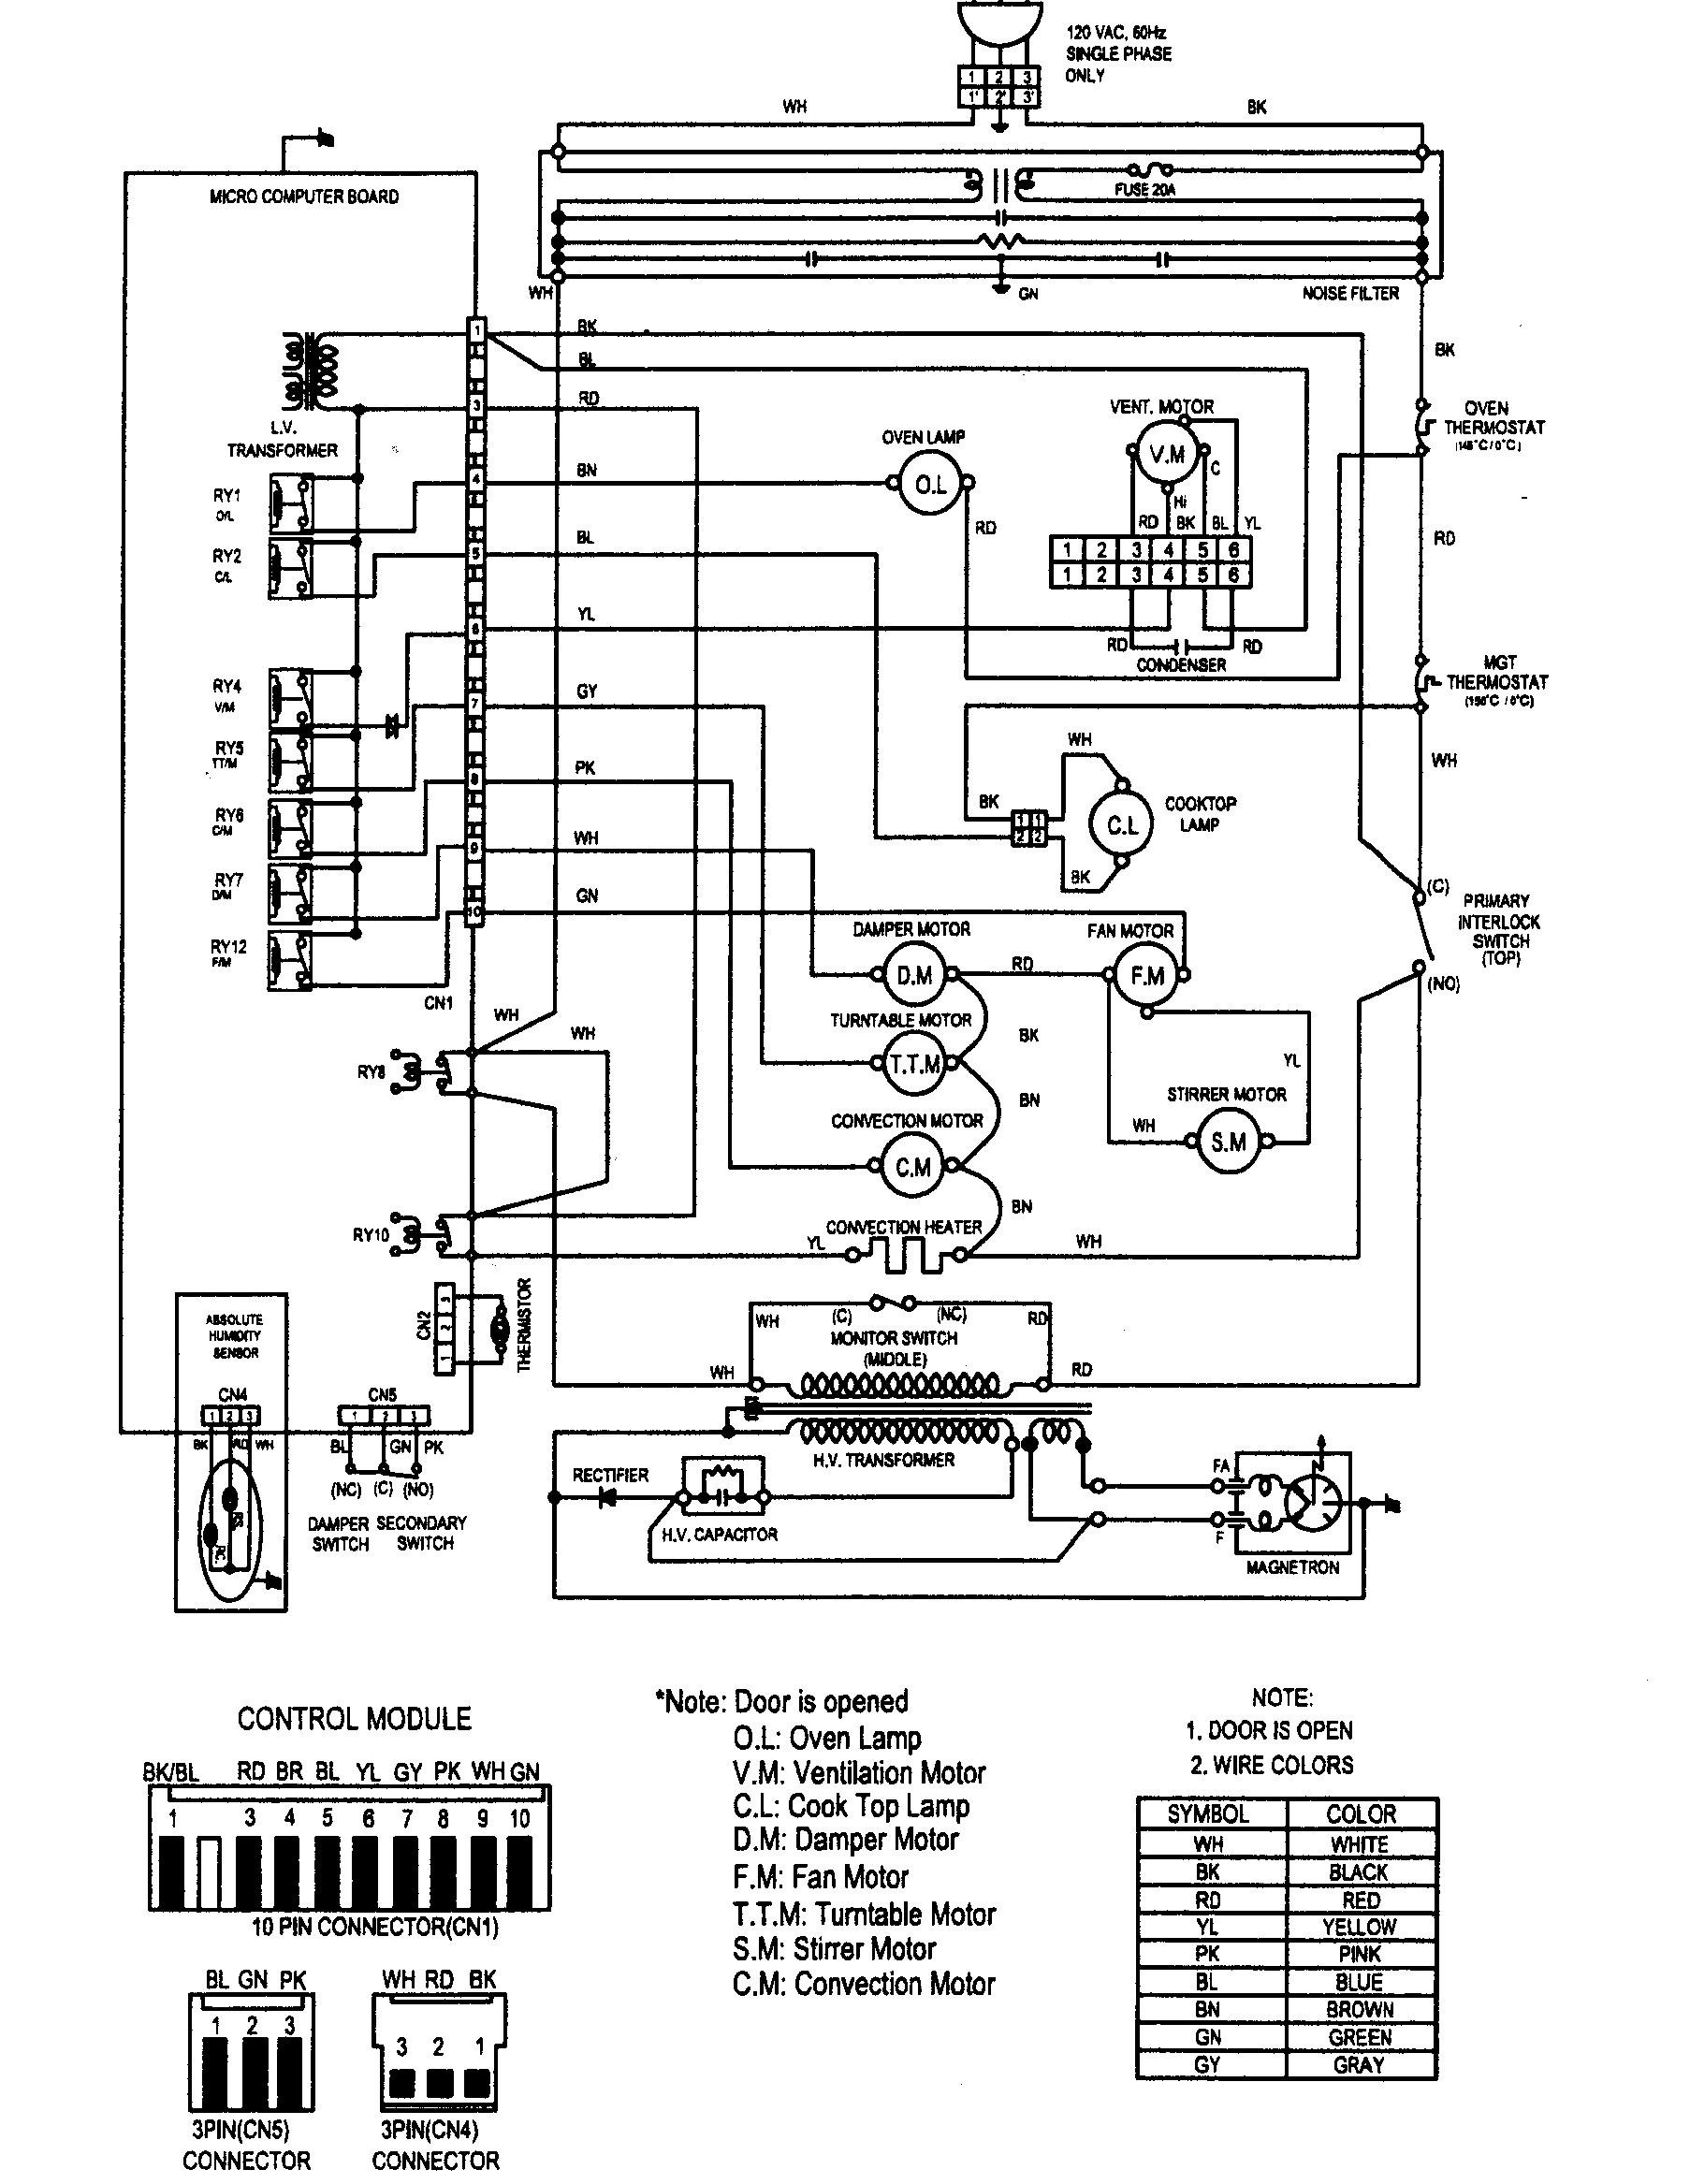 Bosch Dishwasher Wiring Diagram 2 Wiring Diagram for Kenmore Elite Refrigerator Copy Coachedby Of Bosch Dishwasher Wiring Diagram 2